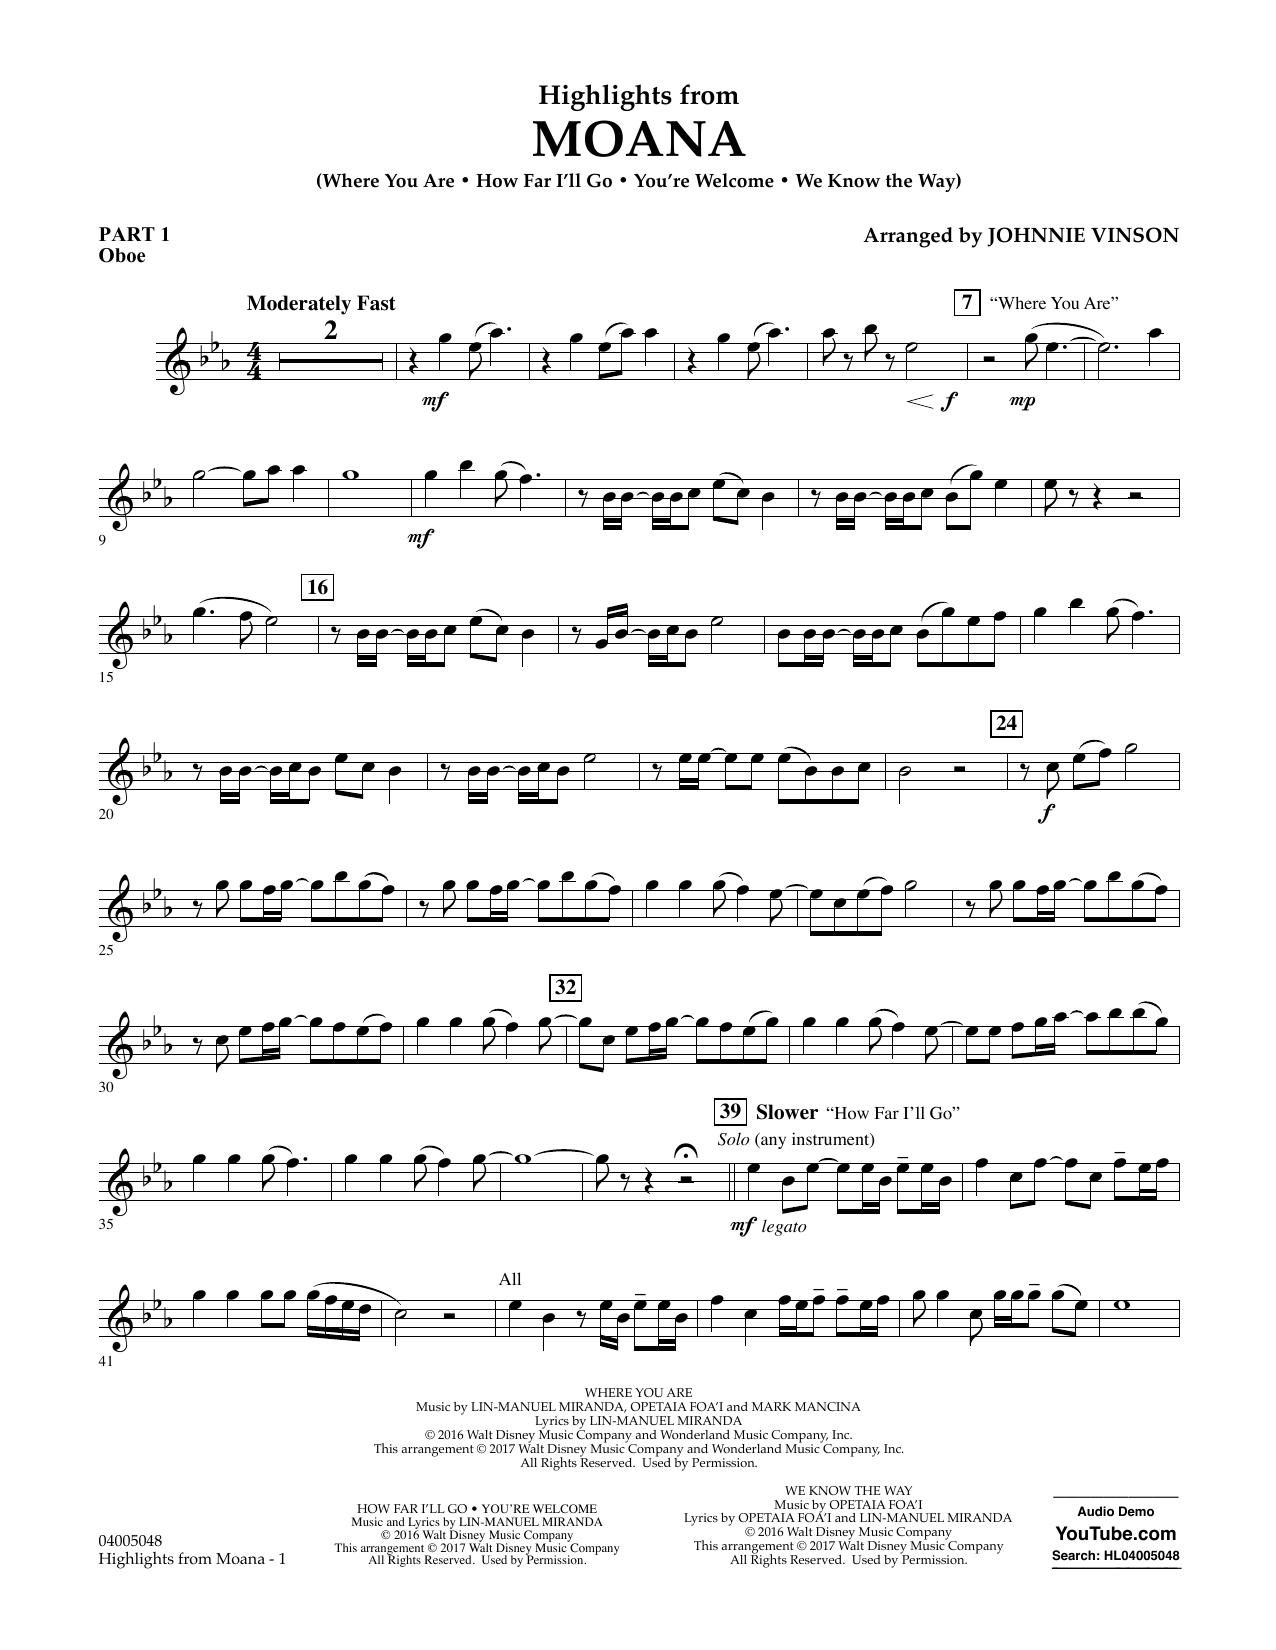 Highlights from Moana - Pt.1 - Oboe Sheet Music